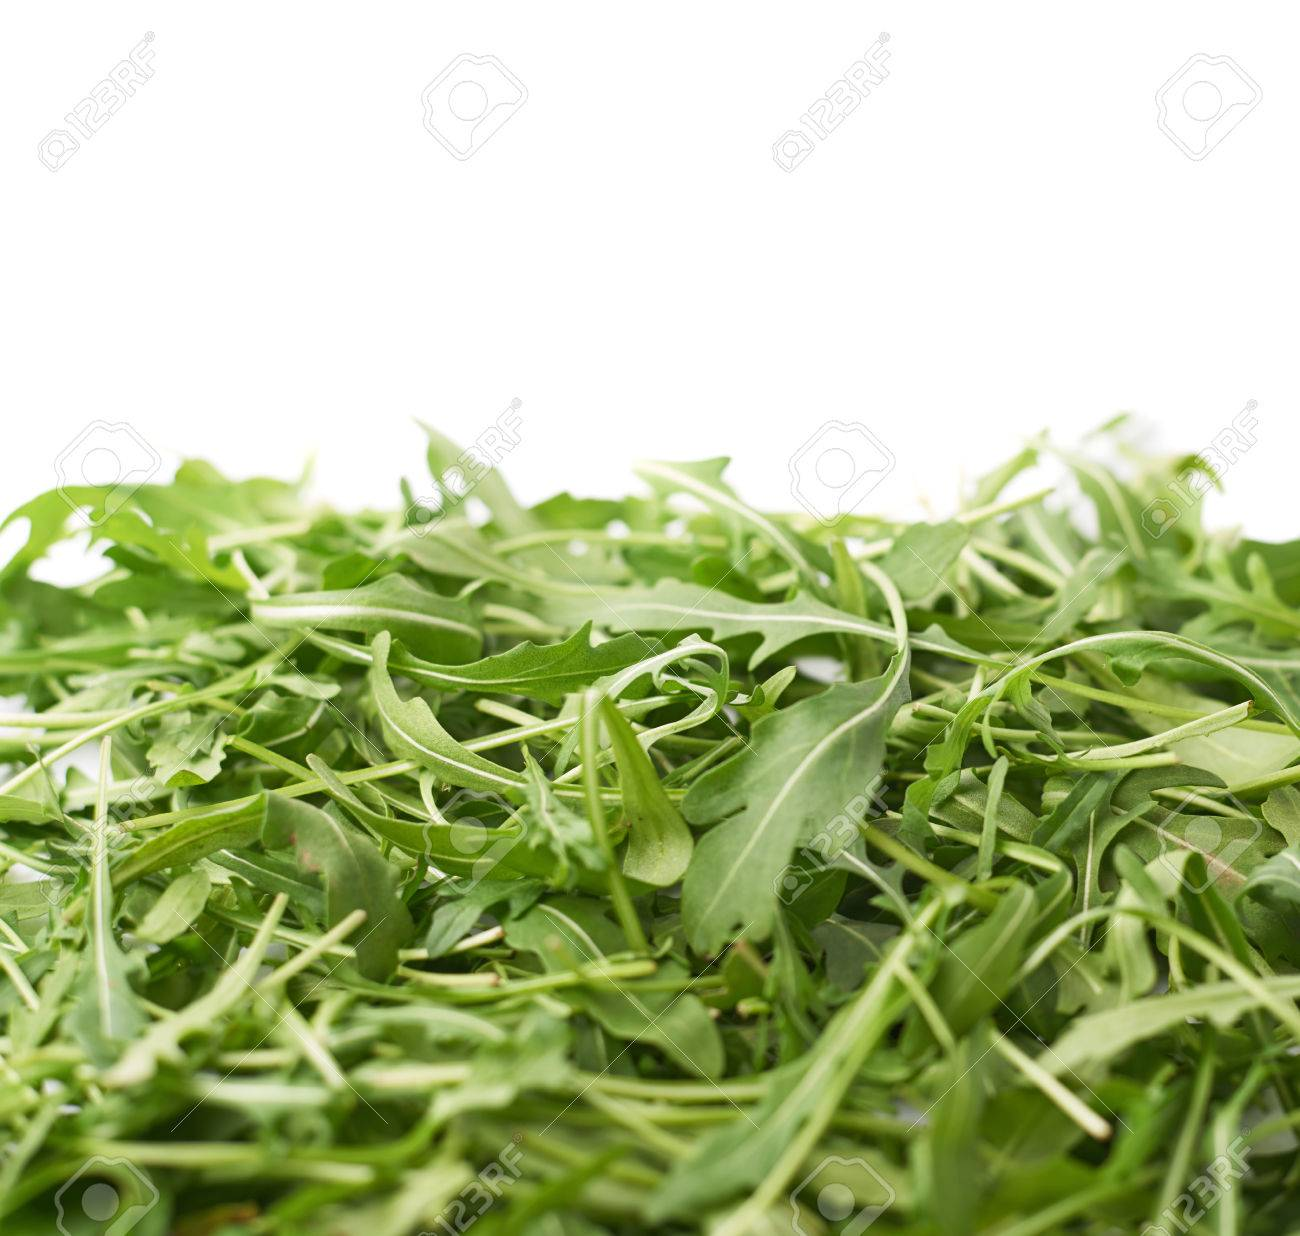 Pile Of Eruca Sativa Rucola Arugula Fresh Green Rocket Salad Leaves As A Copye Background Composition